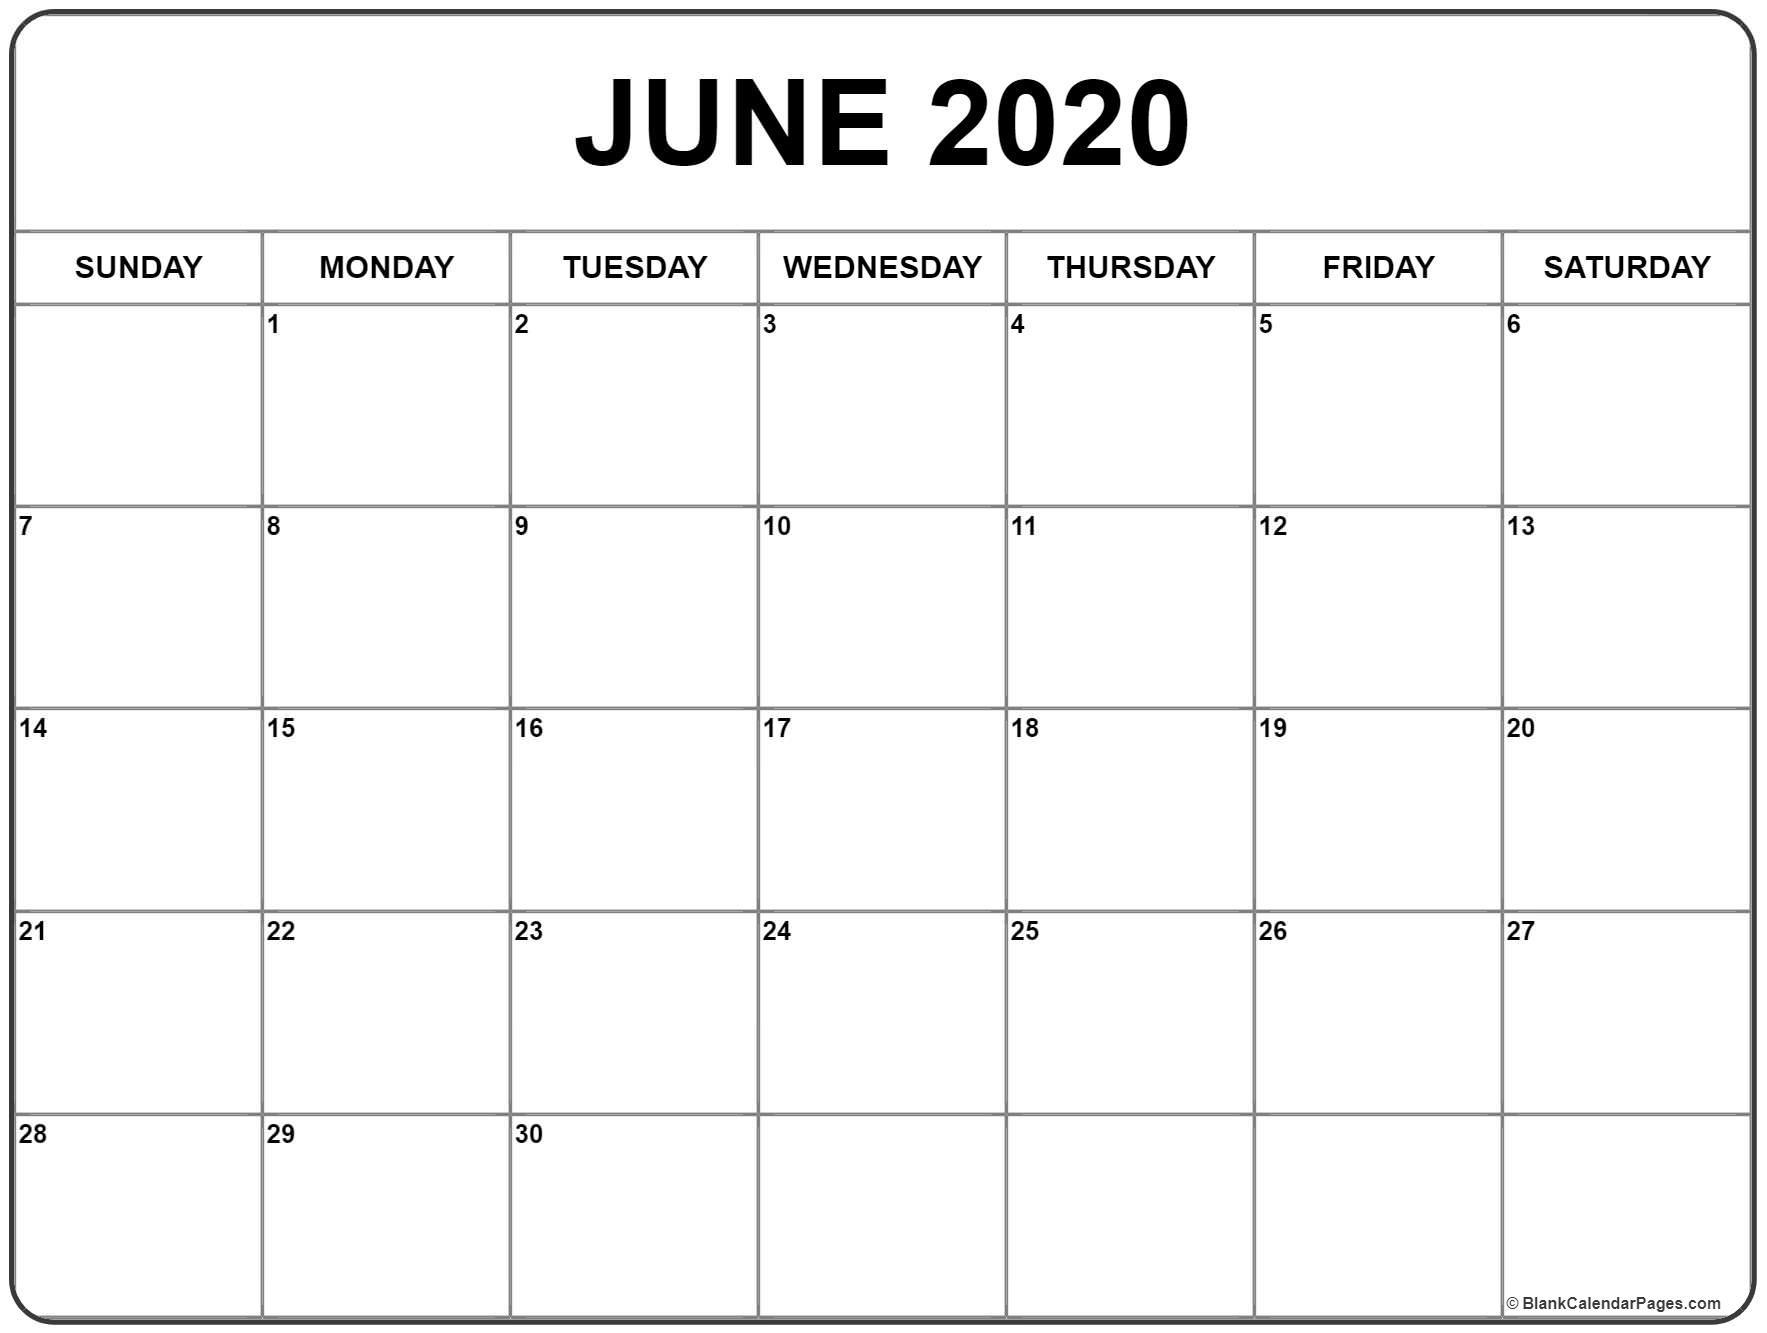 June 2020 Calendar | Free Printable Monthly Calendars regarding Printable  Yearly Calendar June 2019-2020